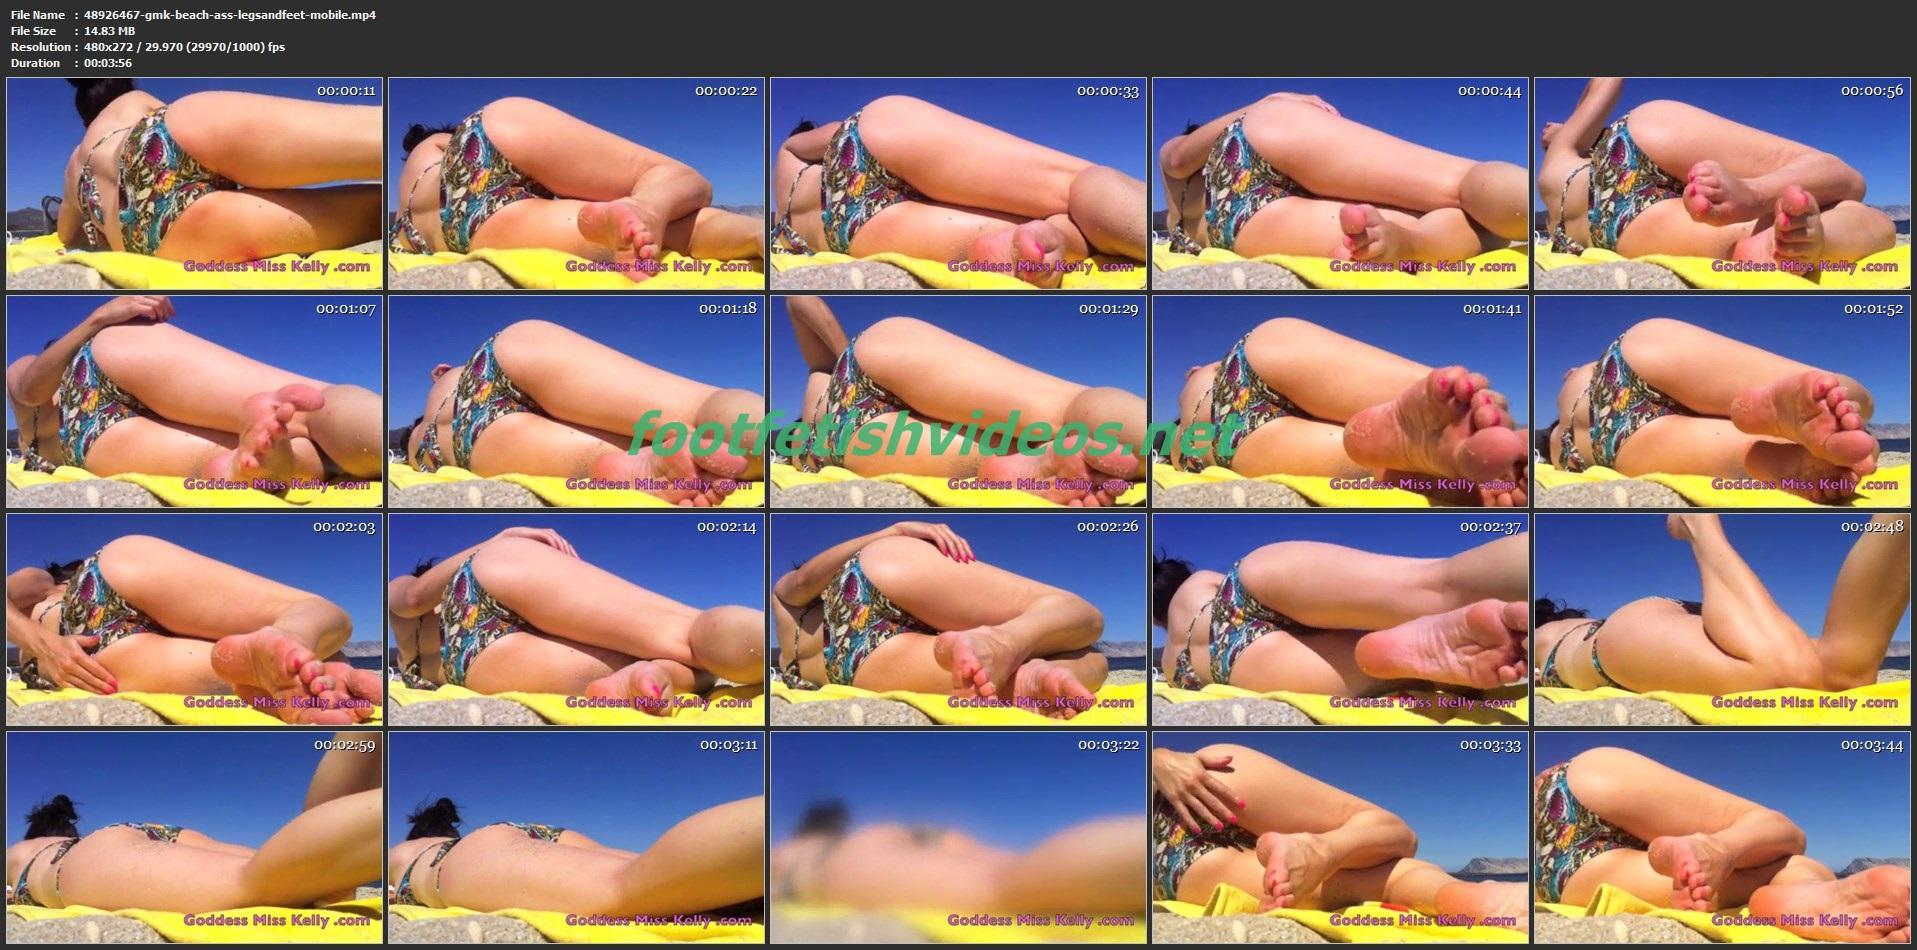 goddessmskelly-48926467-gmk-beach-ass-legsandfeet-mobile-mp4